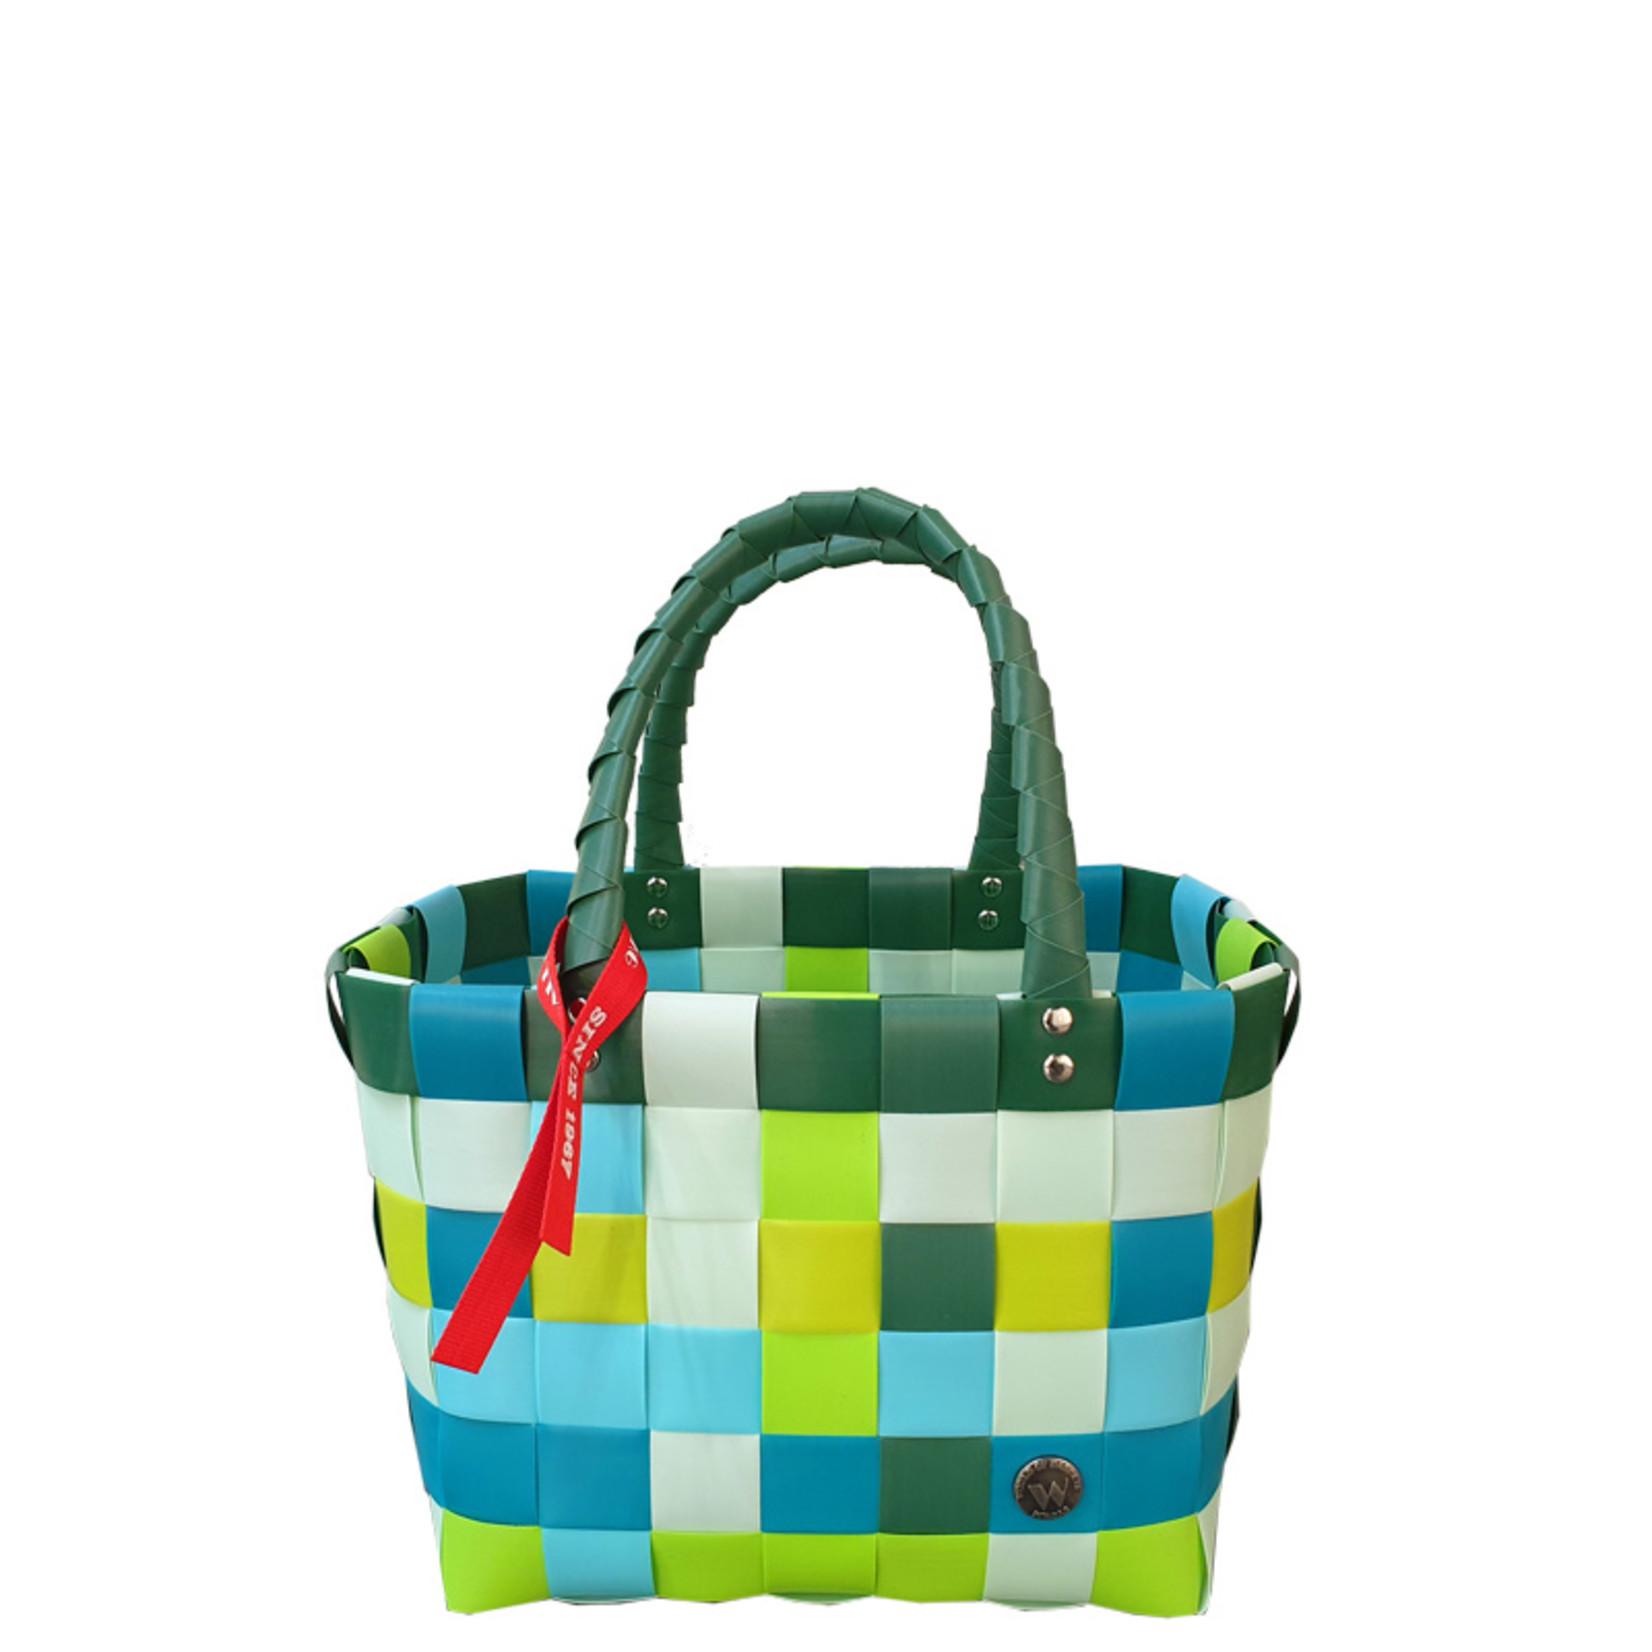 ICE BAG Taschen ICE BAG Mini Shopper 5008-14   Original Witzgall Tasche   grün-blau